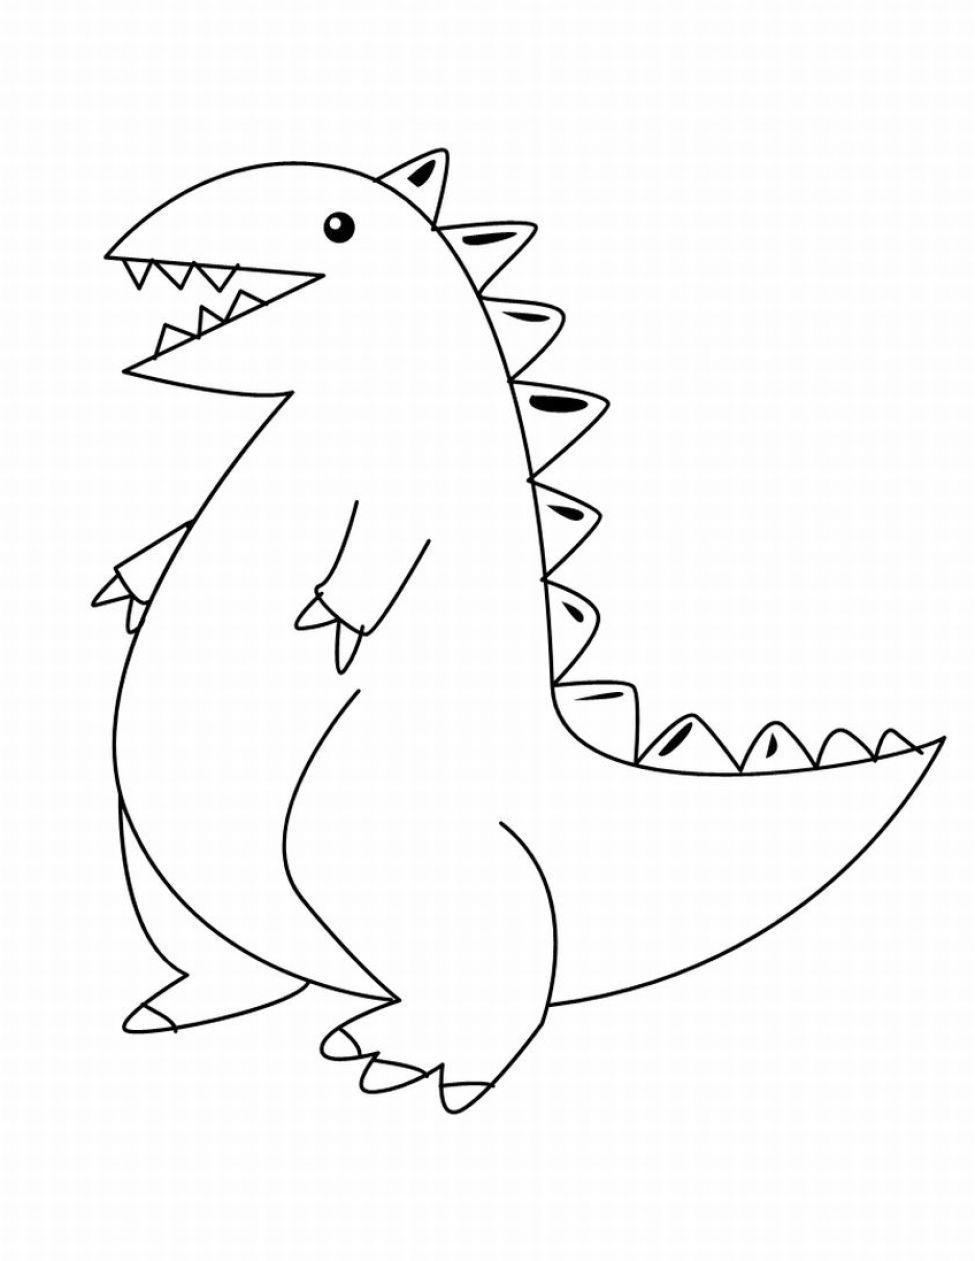 Cute Dinosaur Coloring Pages | Cute cartoon dinosaur coloring pages ...